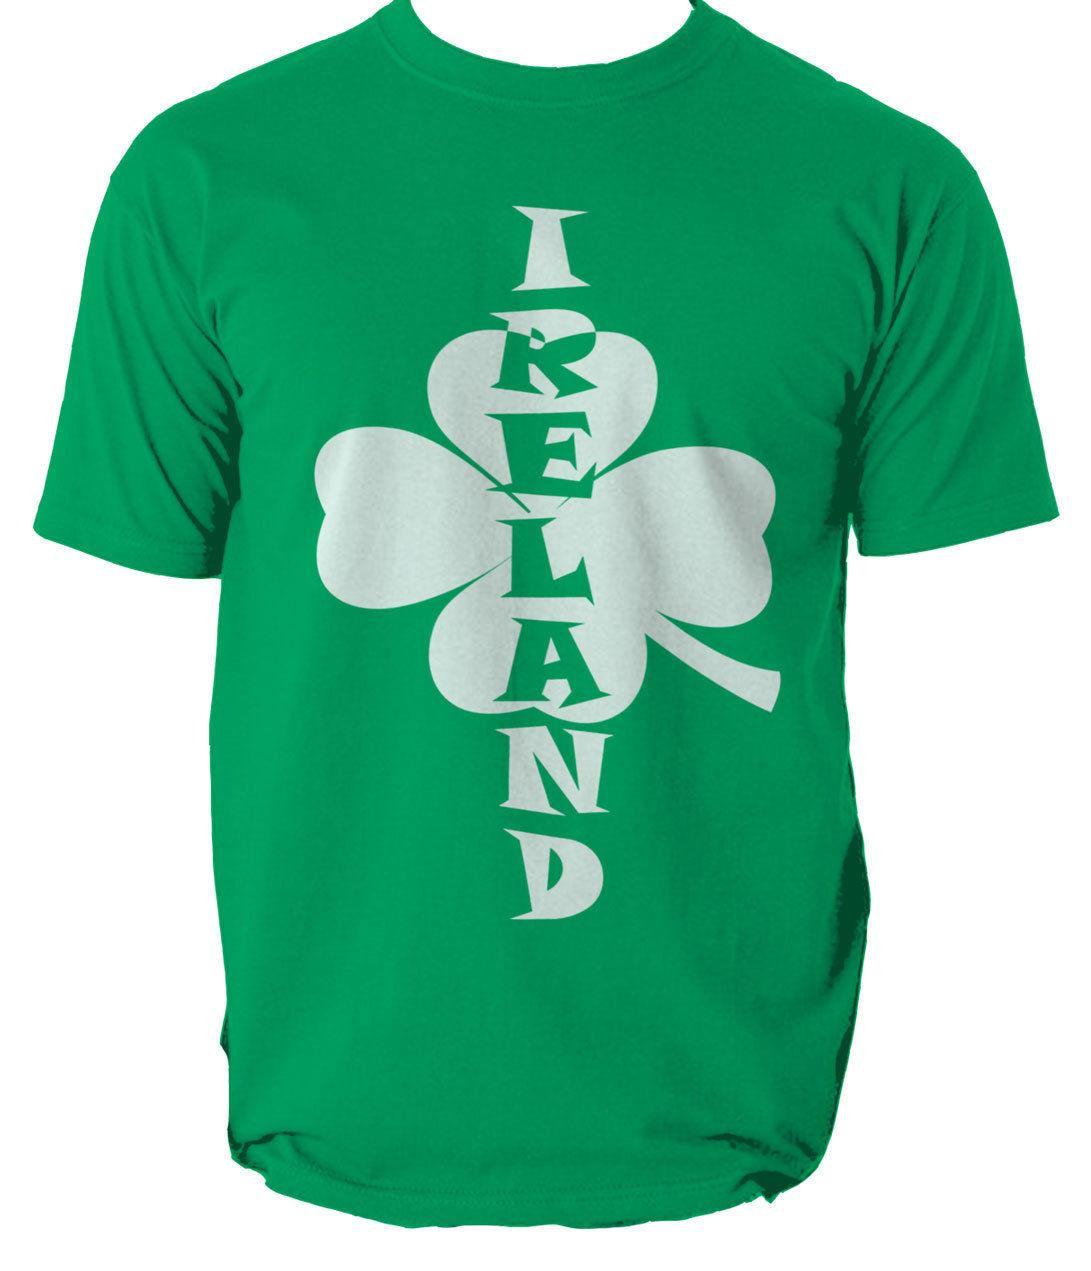 ef37849a6 St Patricks Day T Shirts Mens T Shirt Irish Paddys Funny Ireland Funny  Unisex Casual One T Shirt A Day One Day T Shirt From Fantees, $12.96   DHgate.Com